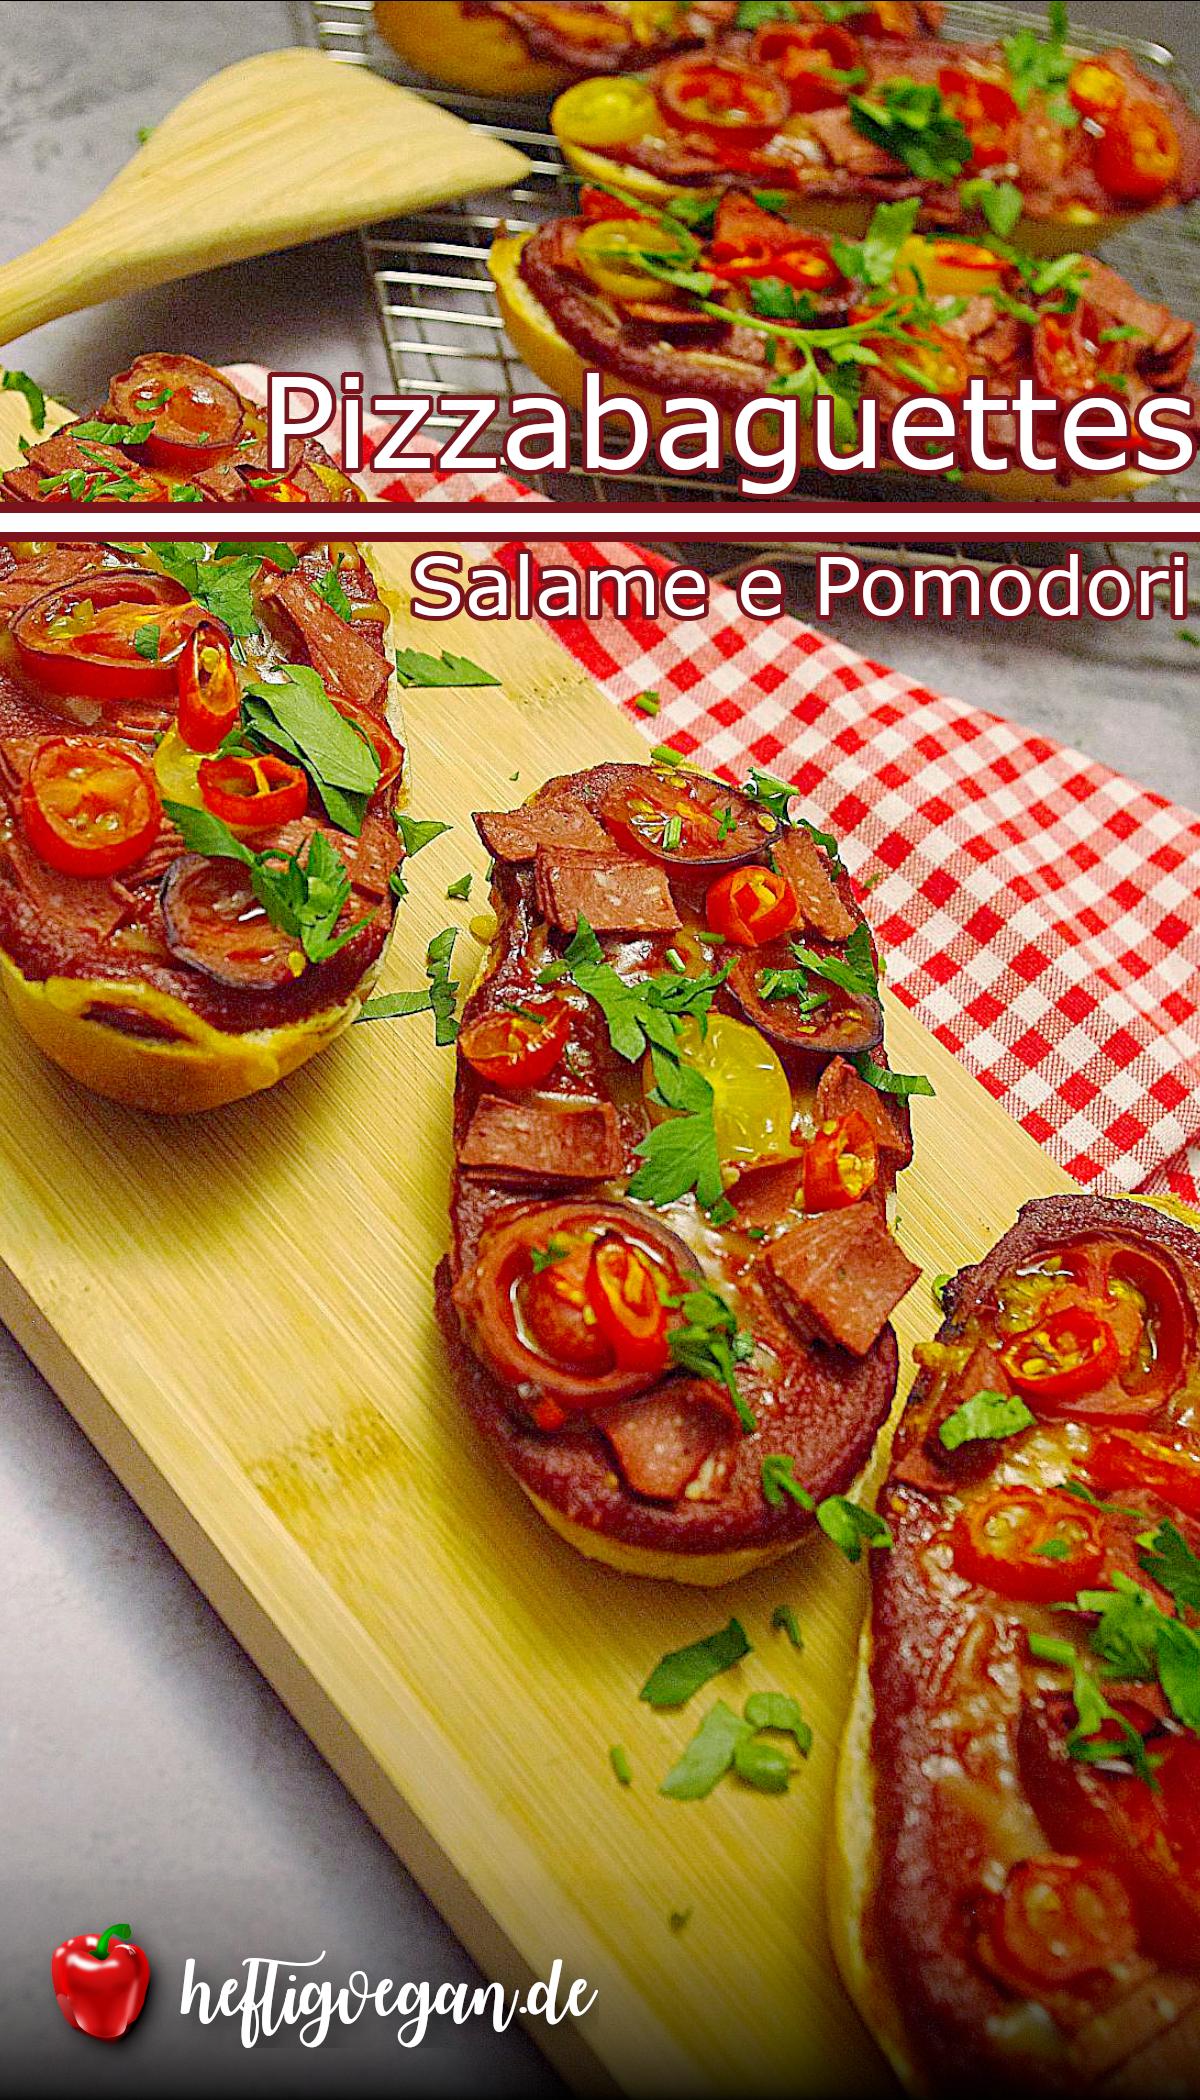 Pizzabaguettes Salame e Pomodori auf Pinterest